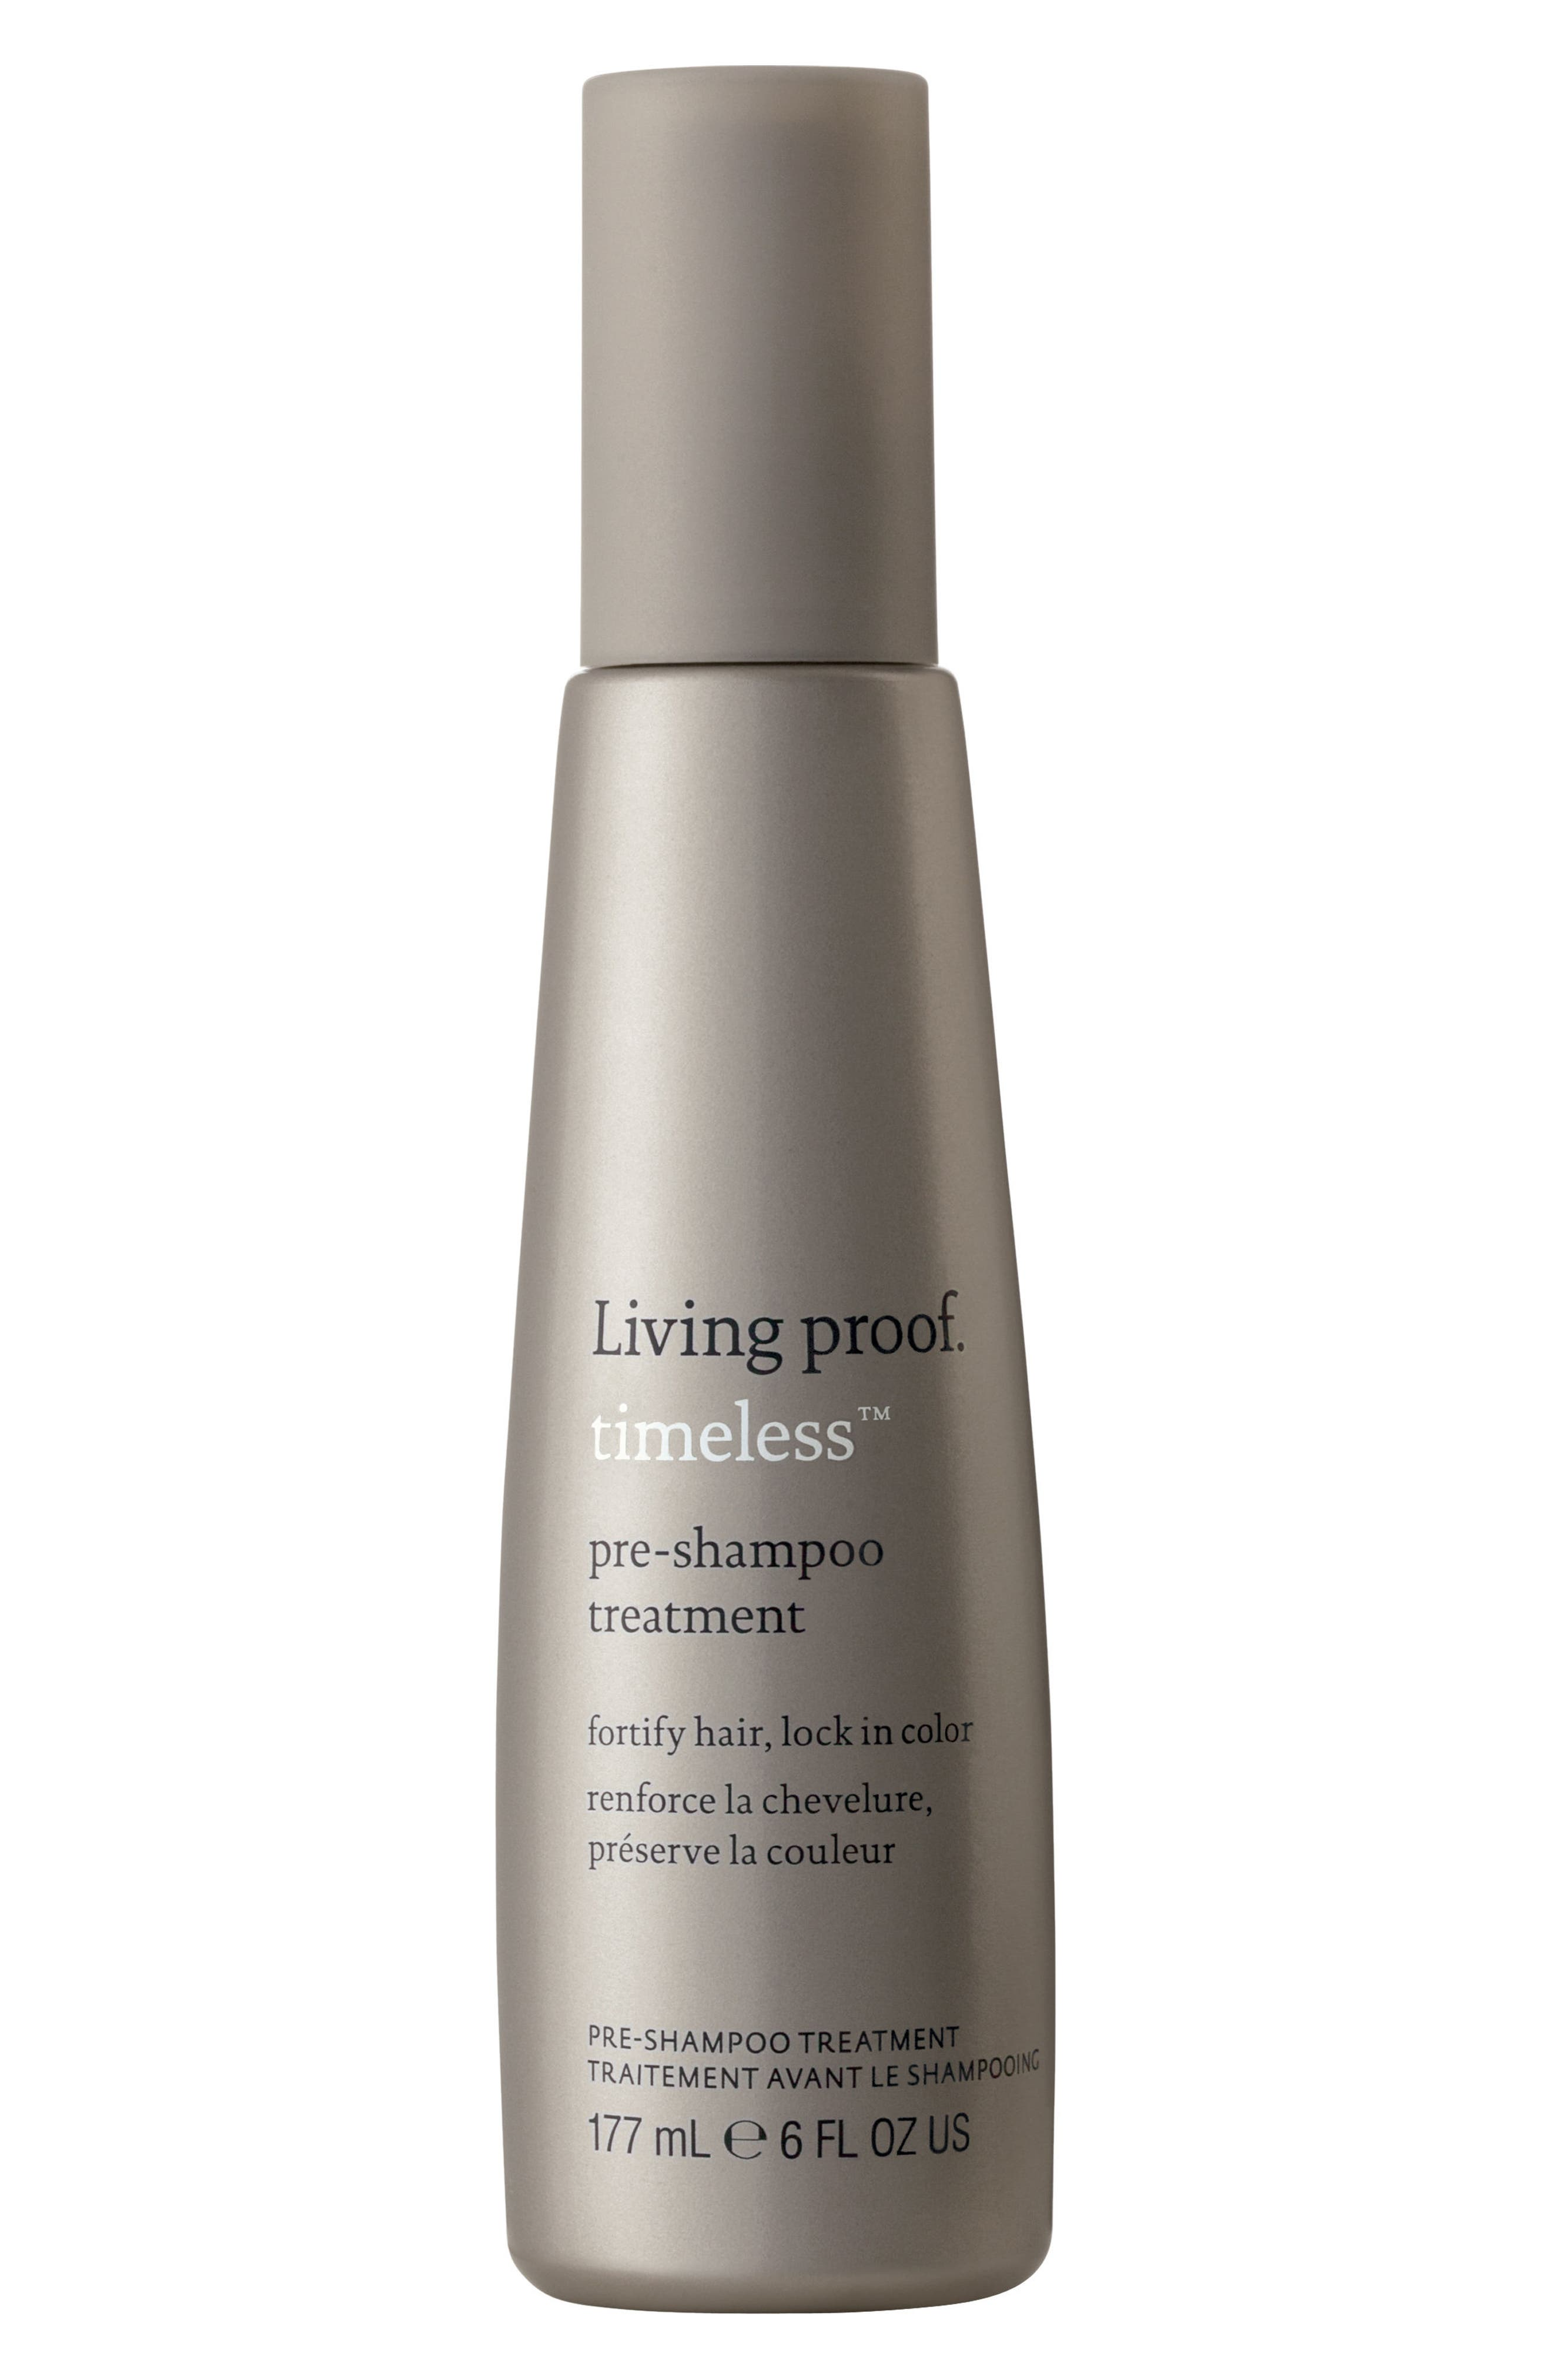 Alternate Image 1 Selected - Living proof® Timeless Pre-Shampoo Treatment